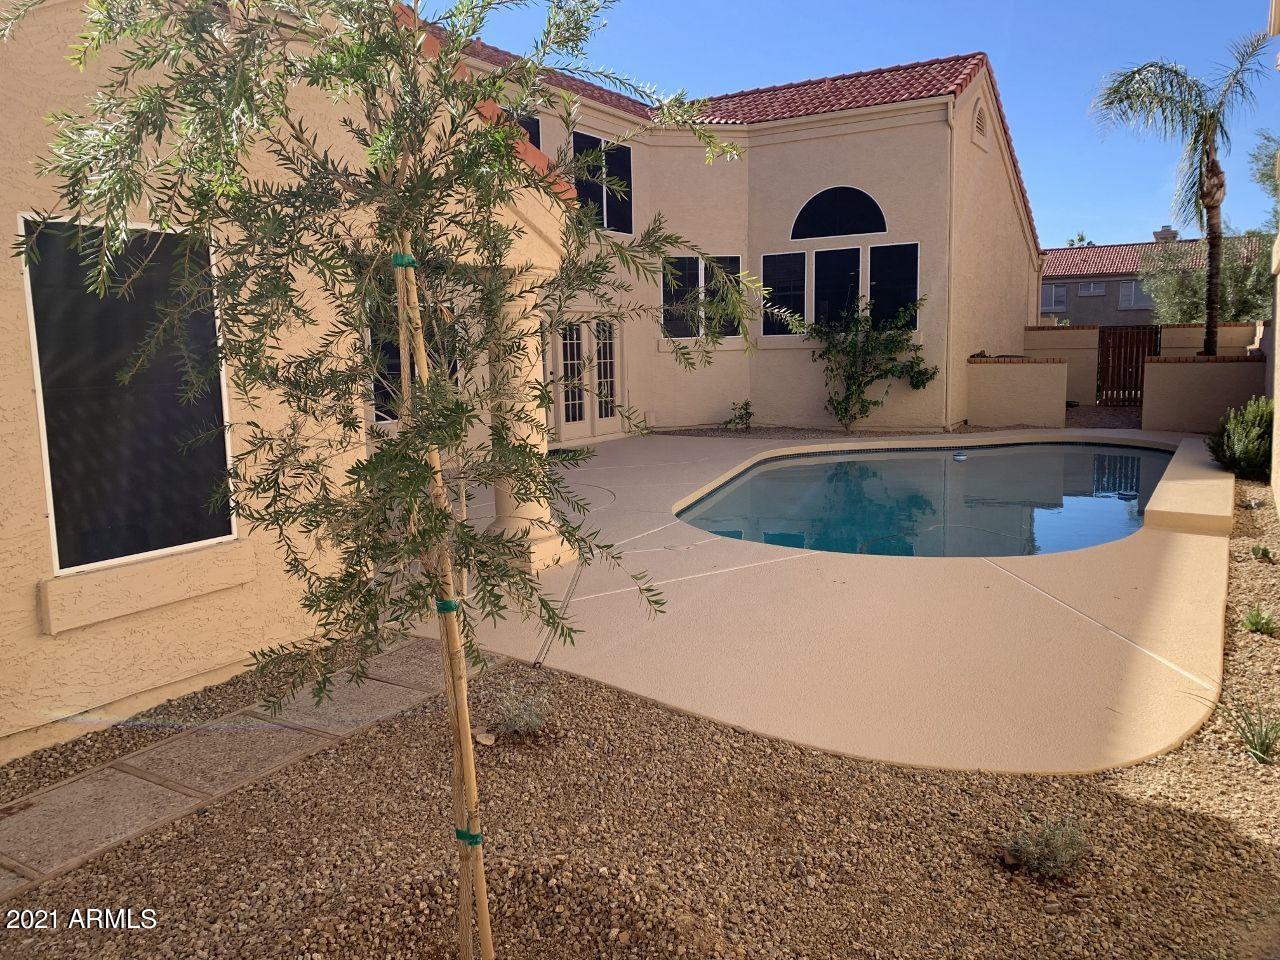 11927 113TH Street, Scottsdale, Arizona 85259, 4 Bedrooms Bedrooms, ,3 BathroomsBathrooms,Residential,For Sale,113TH,6179794